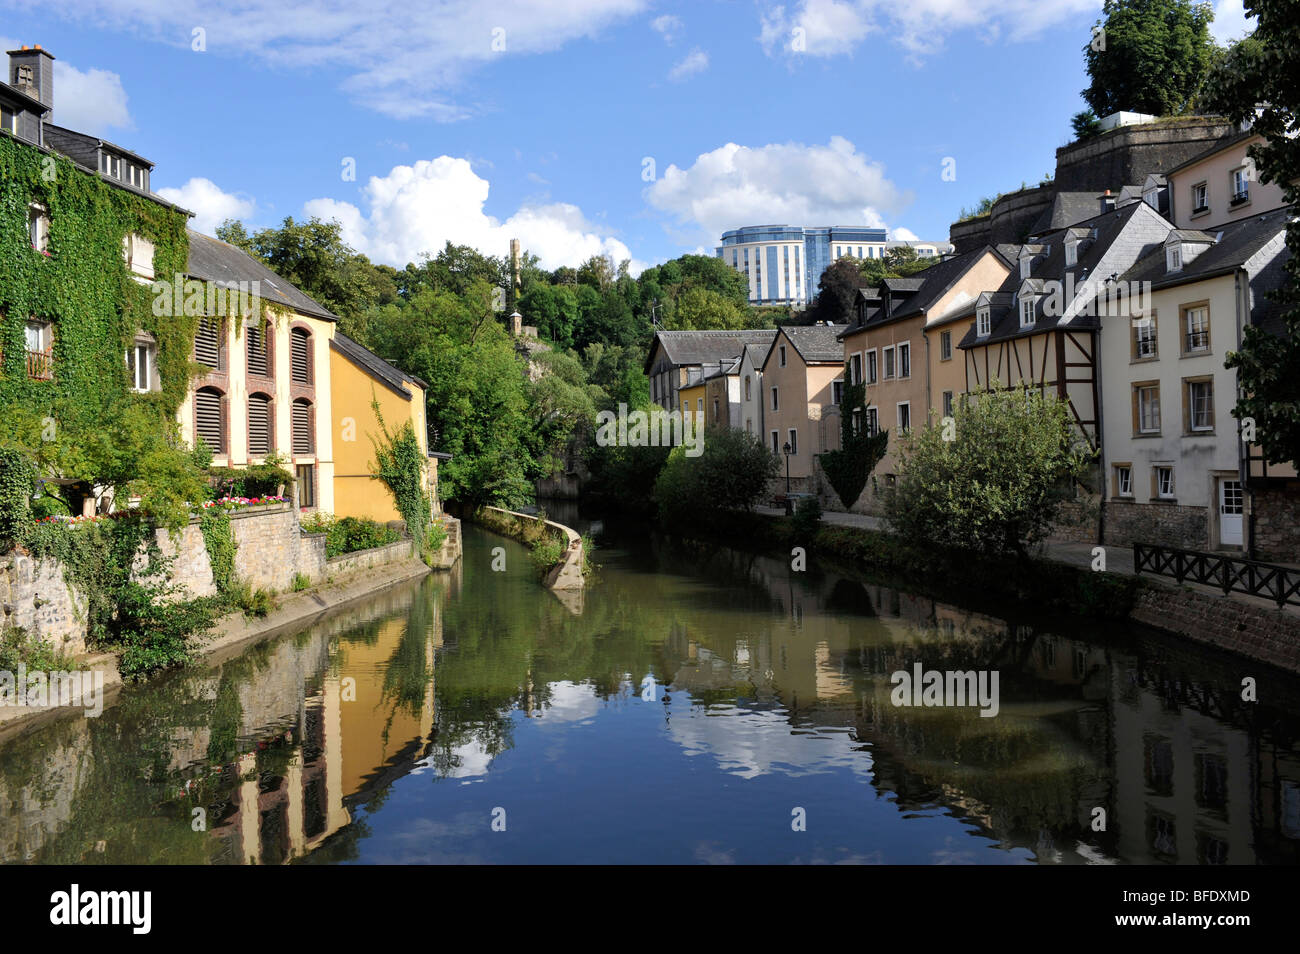 Fluss Aizette fließt durch die Altstadt, Luxemburg-Stadt Europas. Stockbild